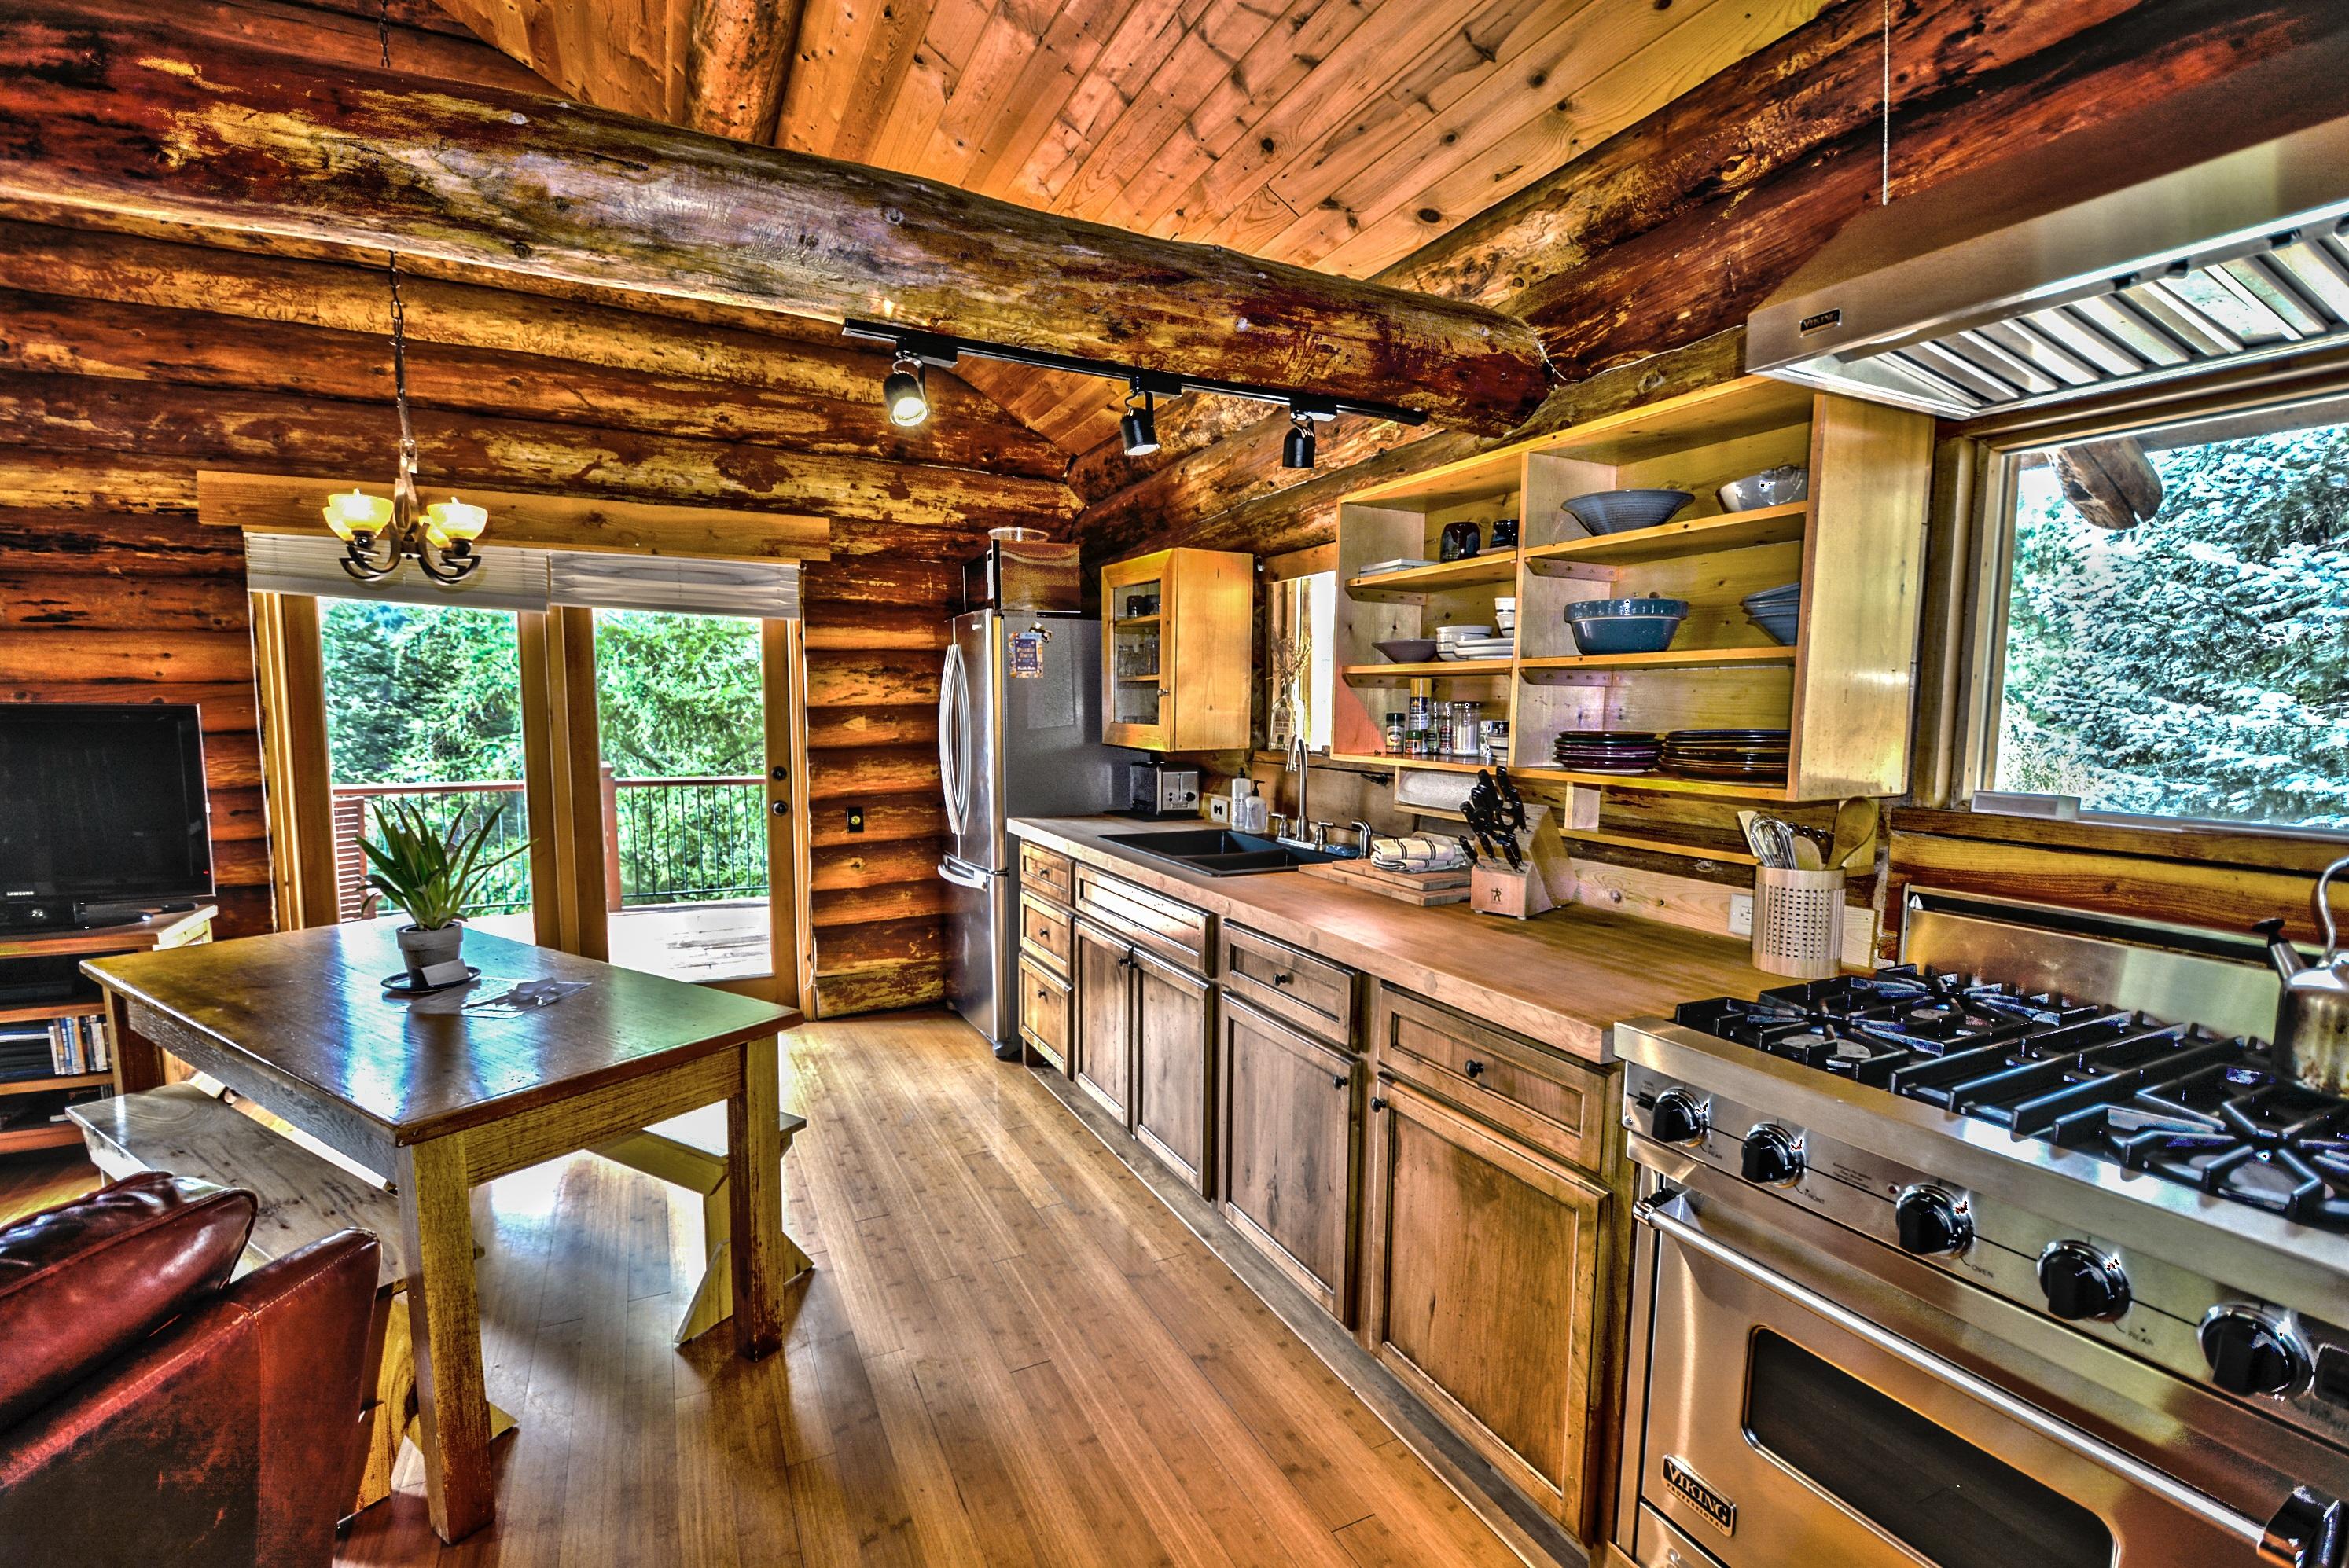 Kostenlose foto : Holz, Landschaft, Villa, Zuhause, Land, rustikal ...